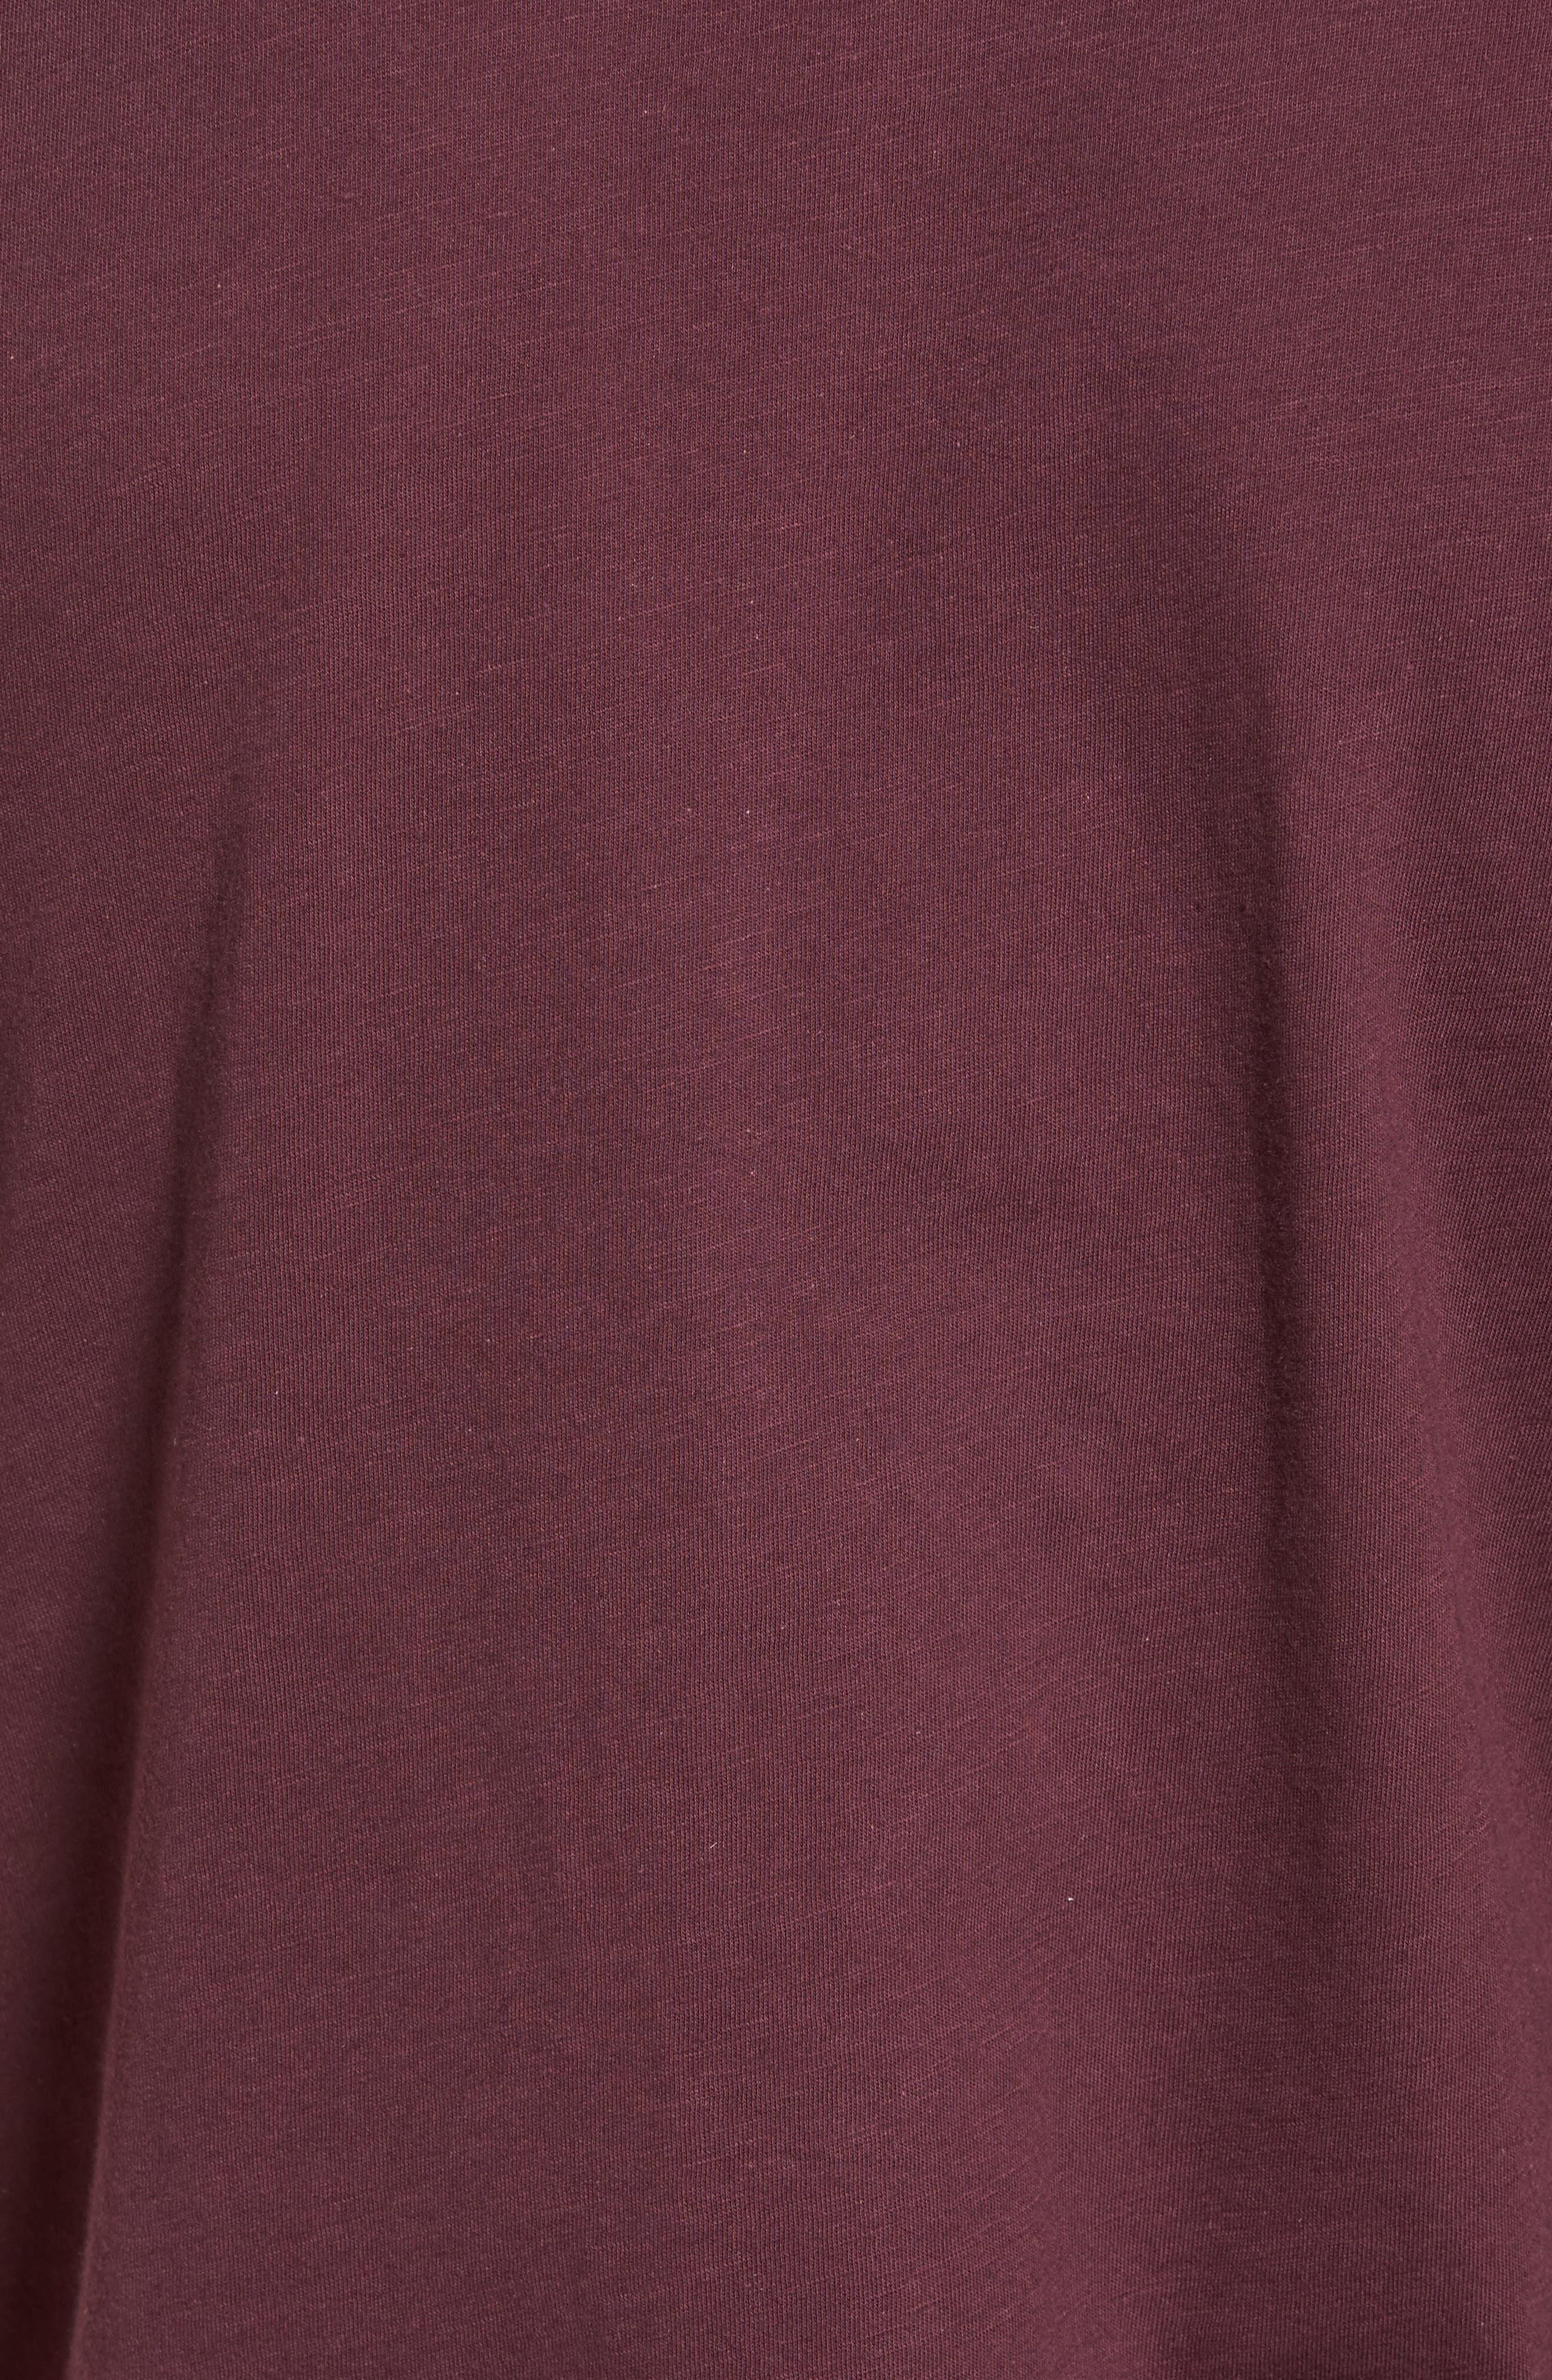 Alternate Image 5  - The Rail Slub Cotton V-Neck T-Shirt (2 for $30)